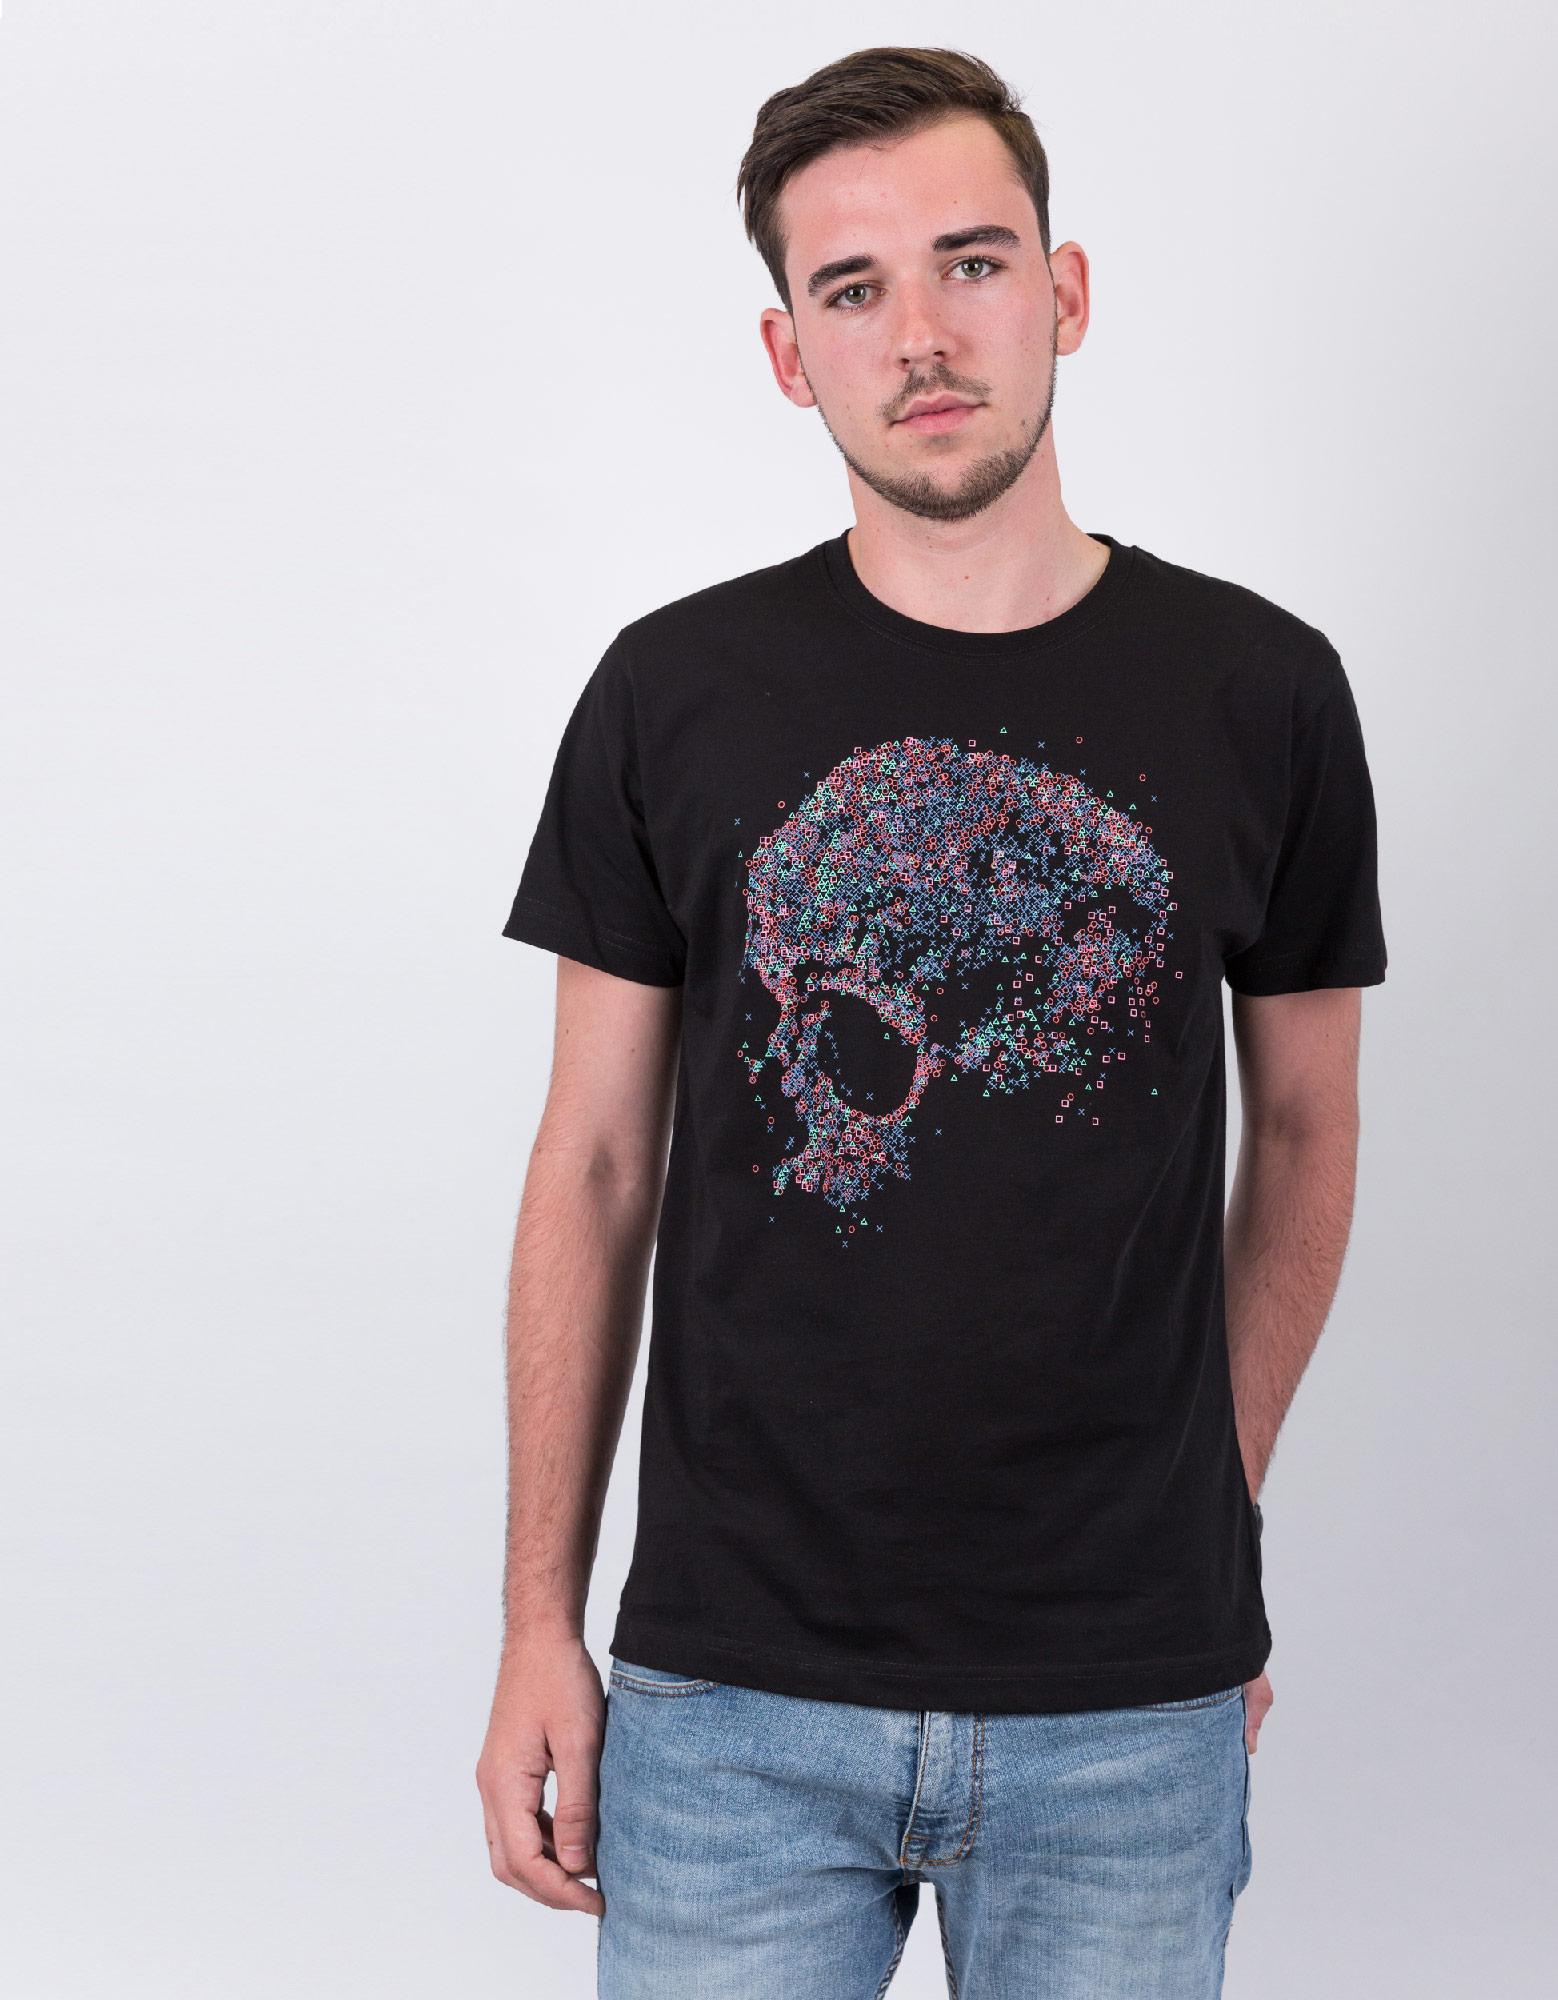 Jo-Bedu Playstation Black Men'S T-Shirt M